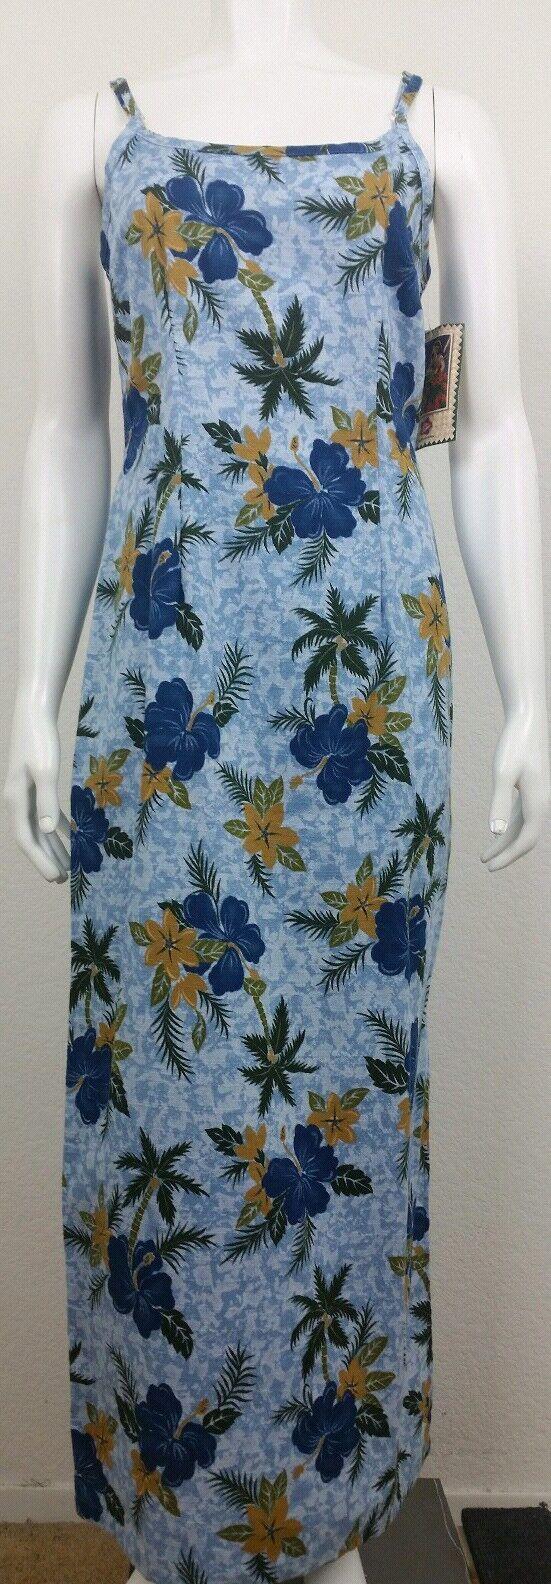 NEW Hilo Hattie Womens Dress Size 10 Hawaiian Floral Sleeveless bluee gold Green